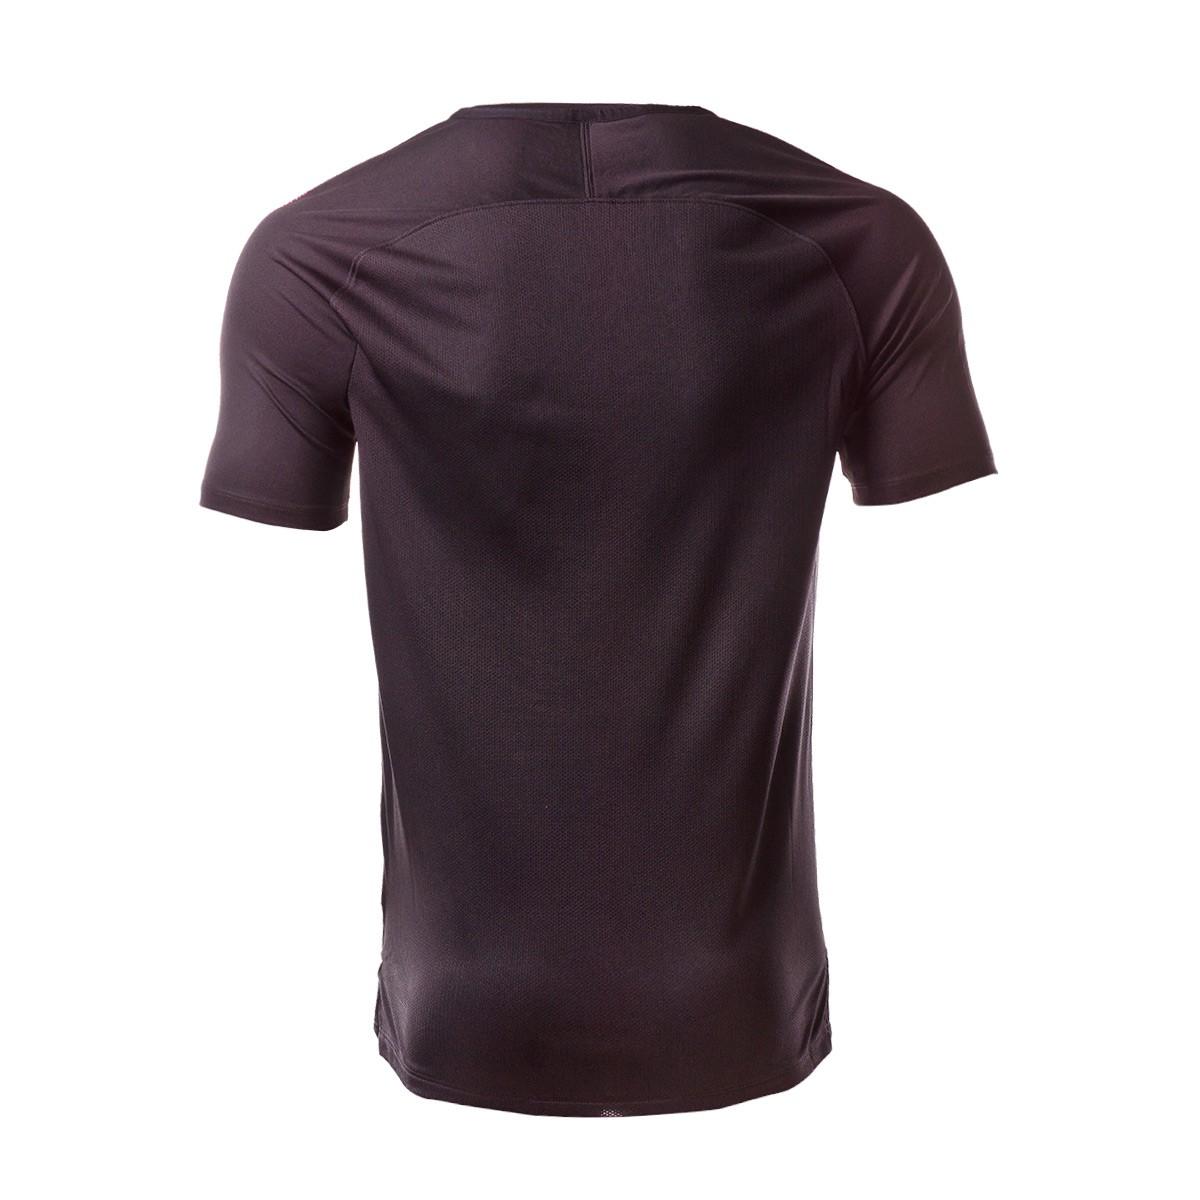 comprar camiseta Paris Saint Germain precio